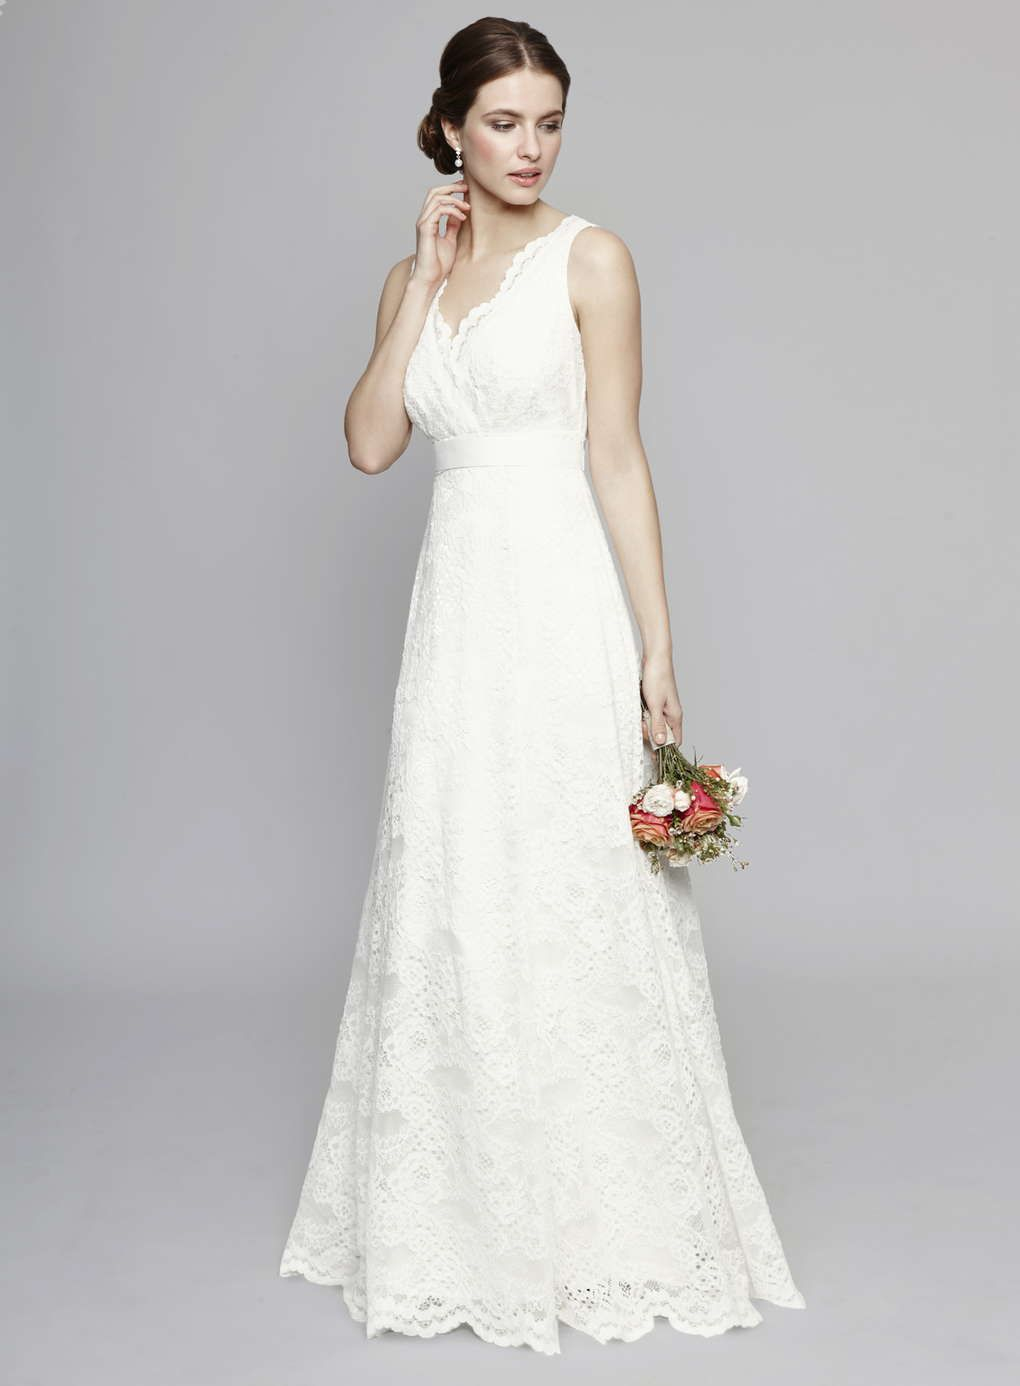 Ivory Bella Keyhole Wedding Dress Http Www Weddingheart Co Uk Bhs Wedding Dresses Html Wedding Dresses Wedding Dresses Under 500 Keyhole Wedding Dress